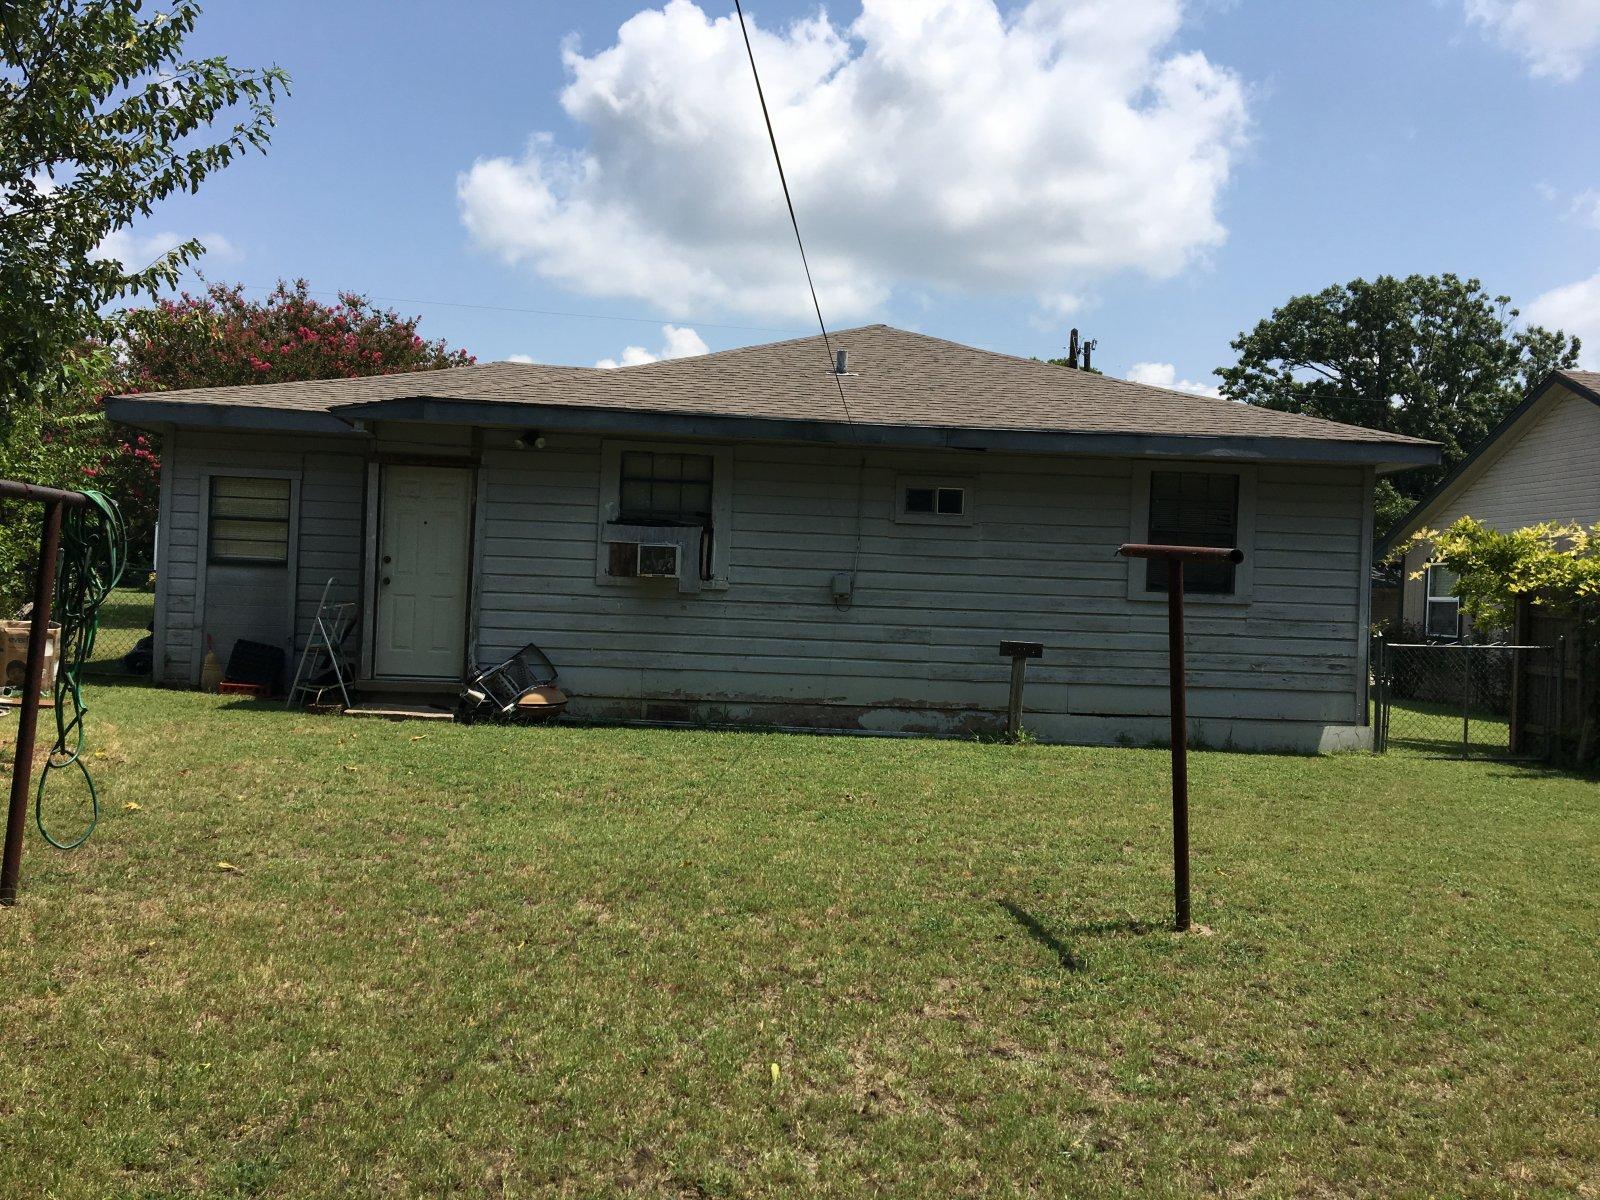 310 S Harrison Ave Sherman Tx 75090 Expert Property